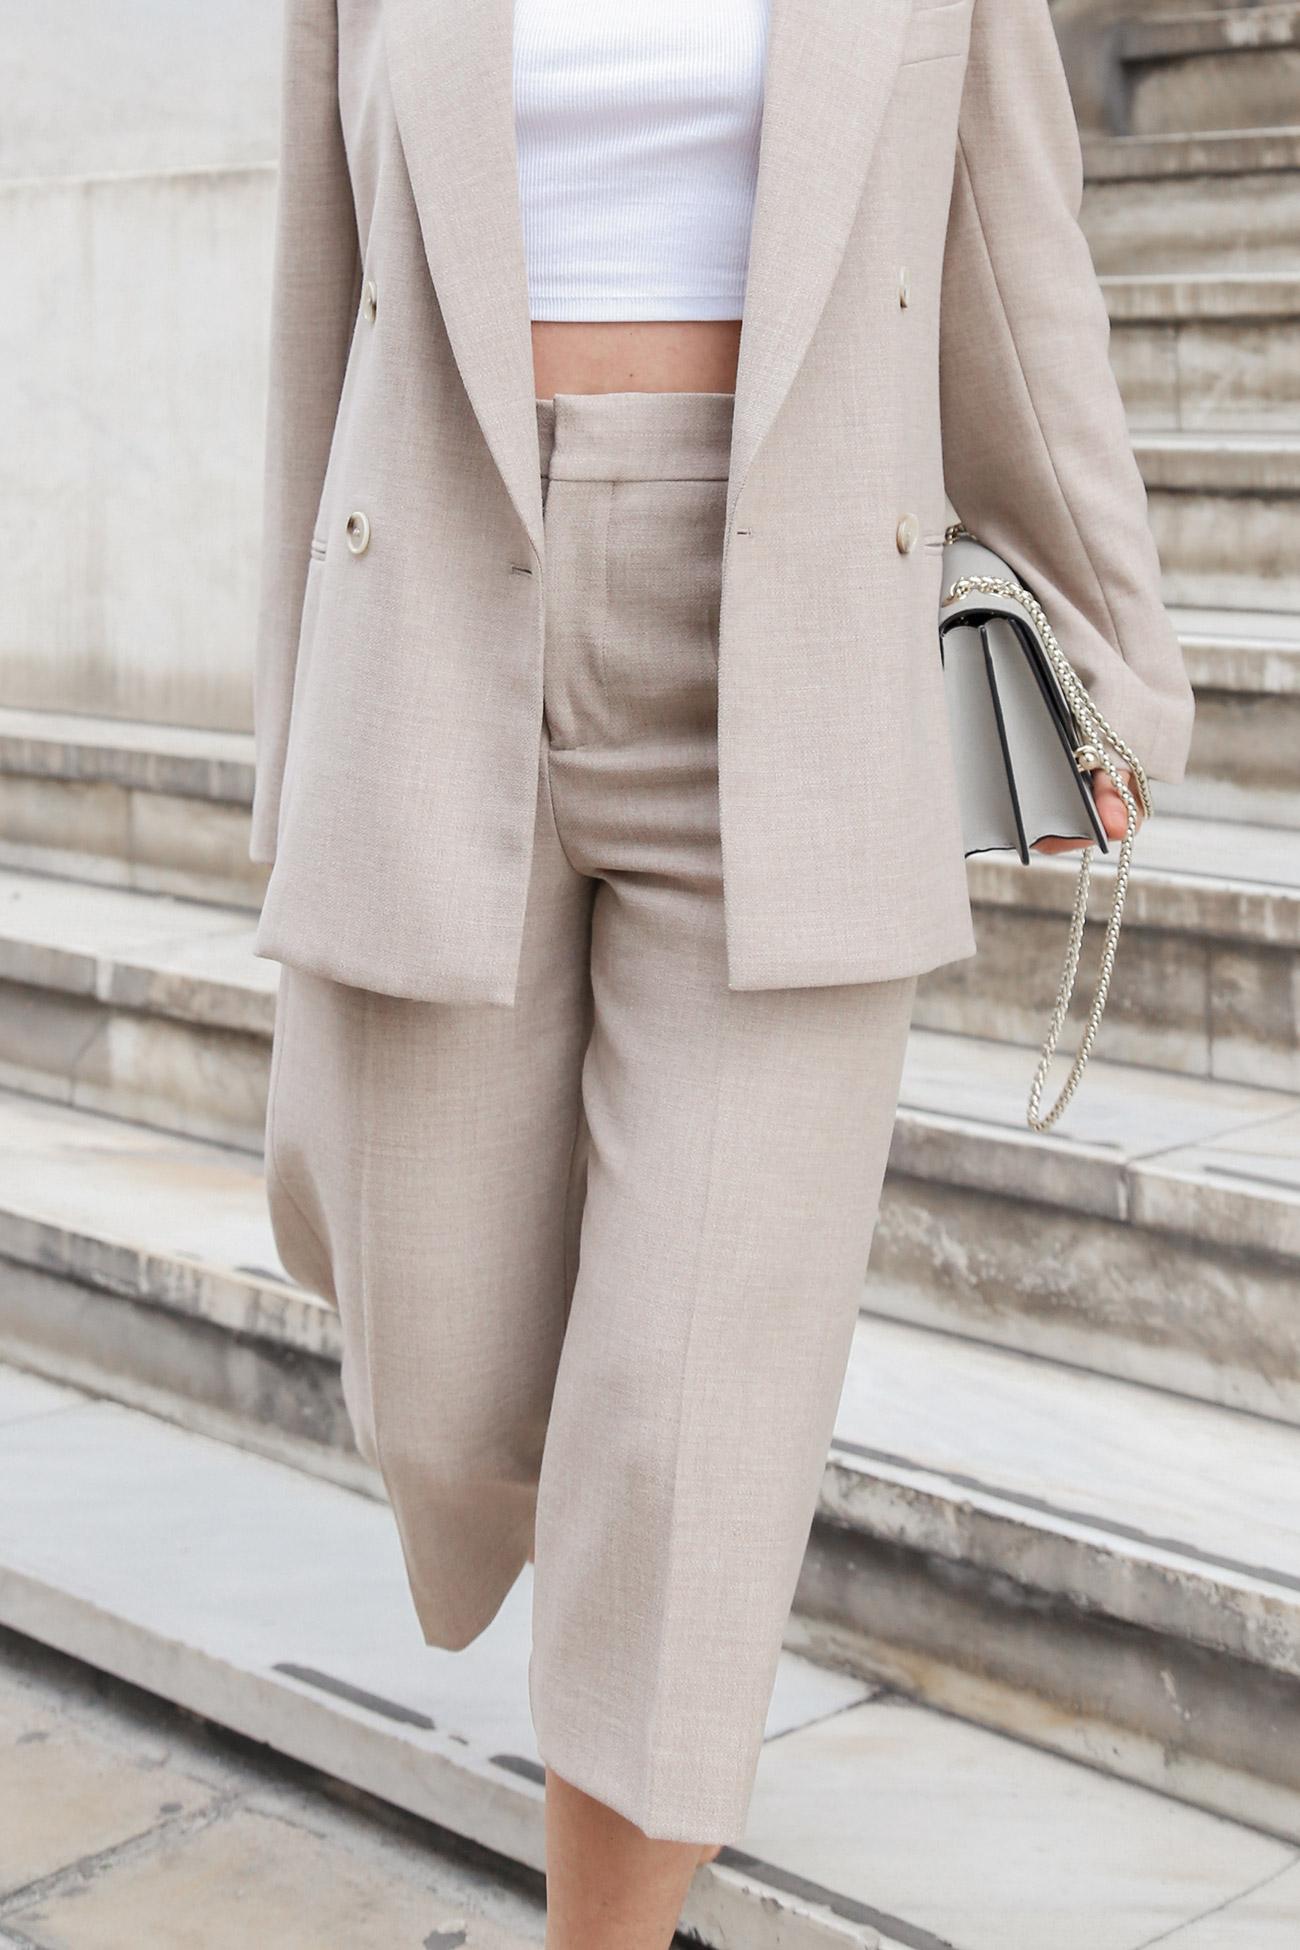 Bermuda suit details